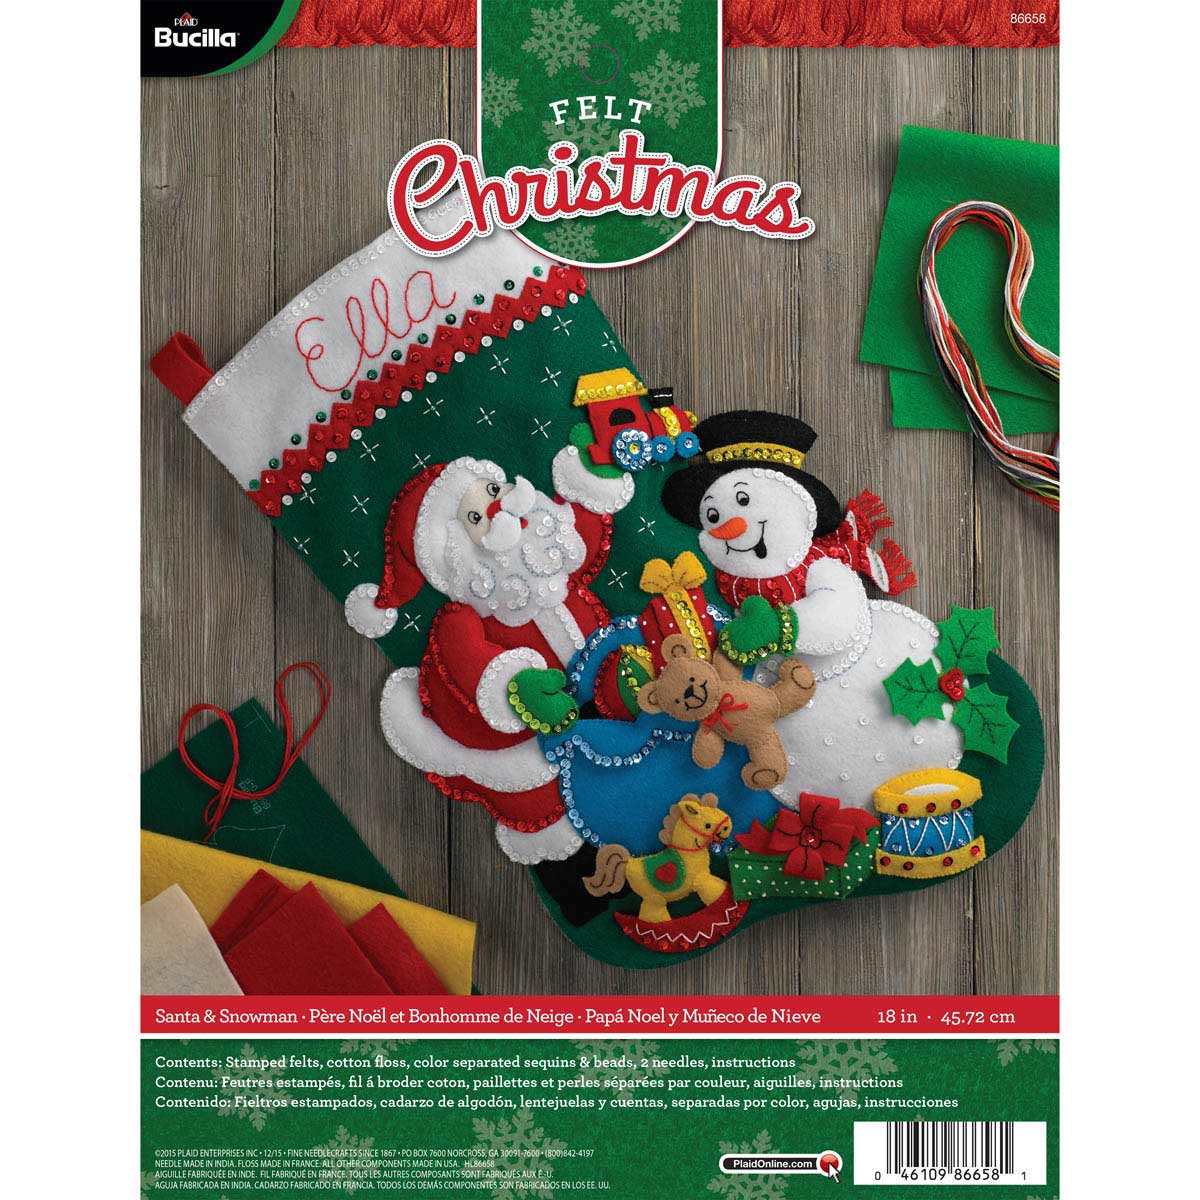 Bucilla ® Seasonal - Felt - Stocking Kits - Santa & Snowman - 86658